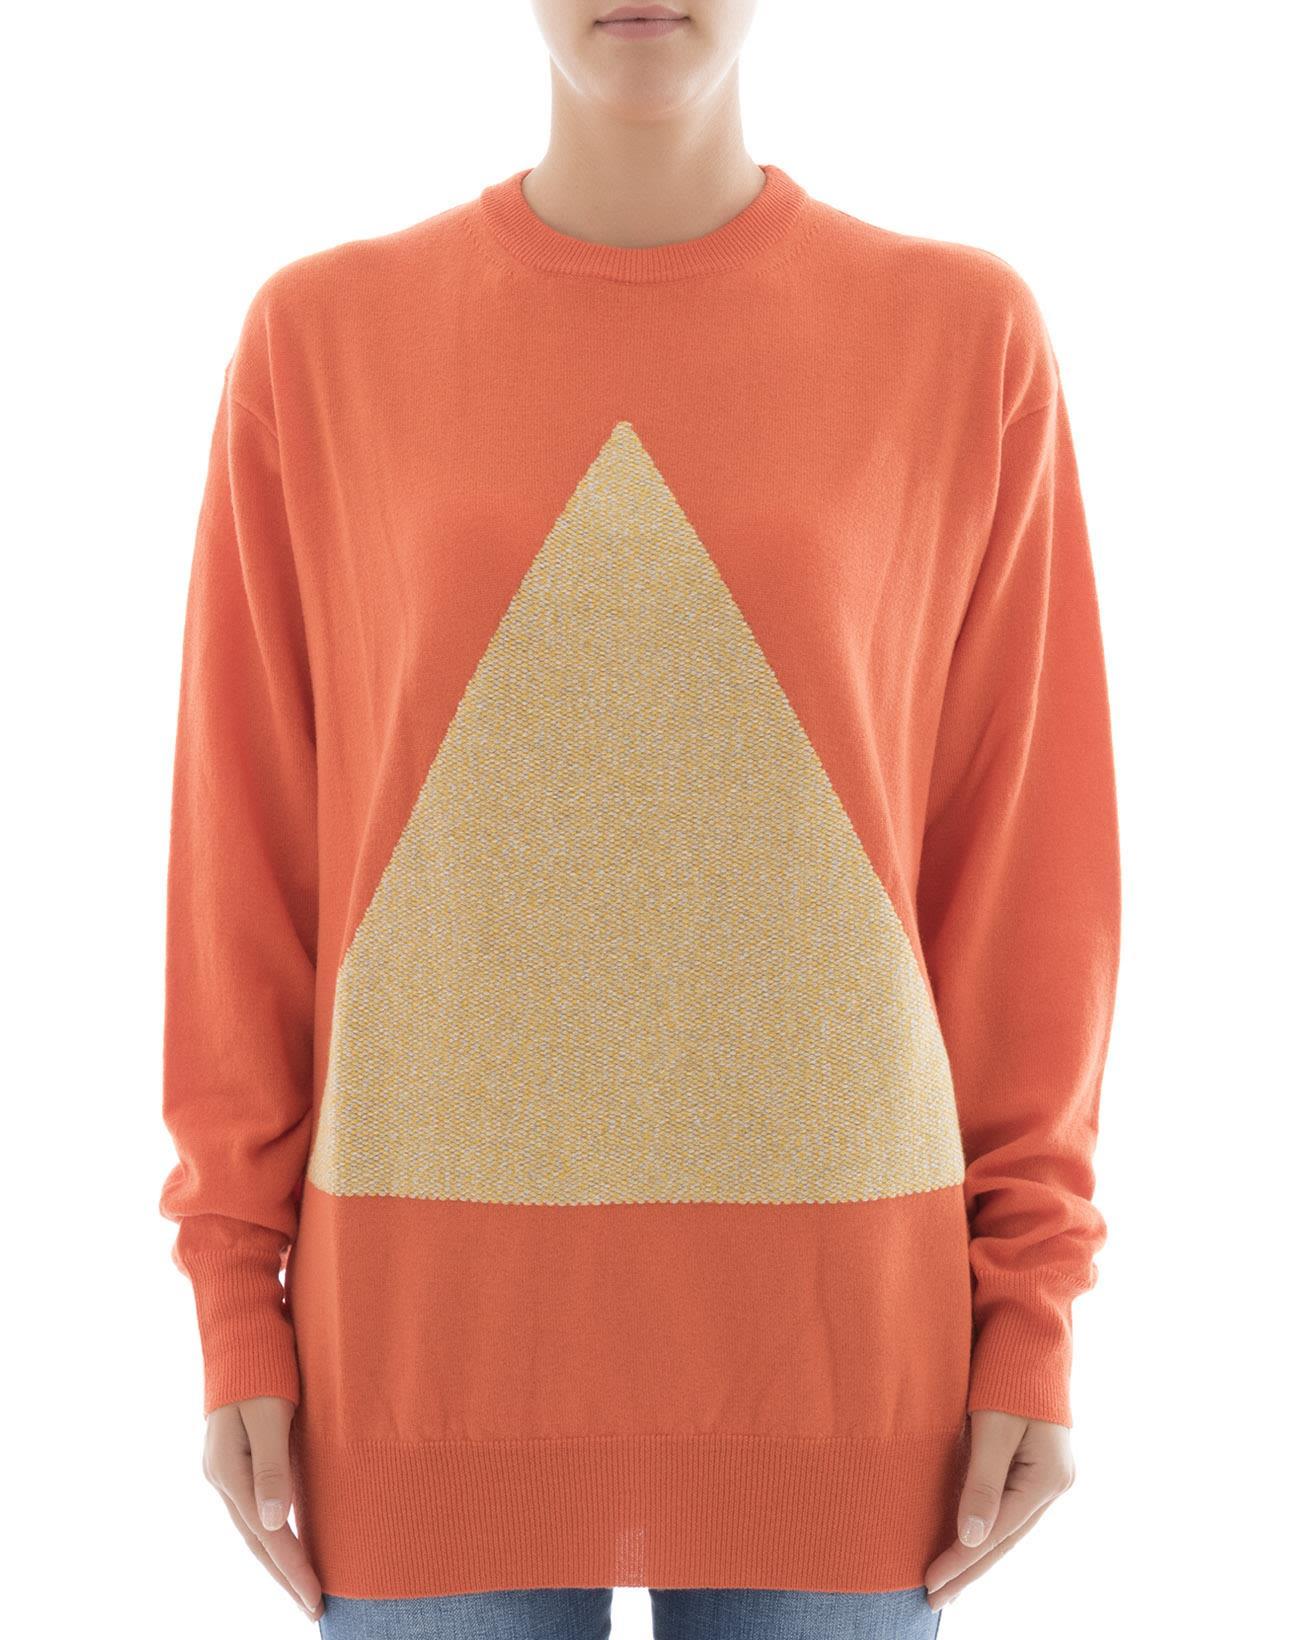 Orange Wool Sweatshirt